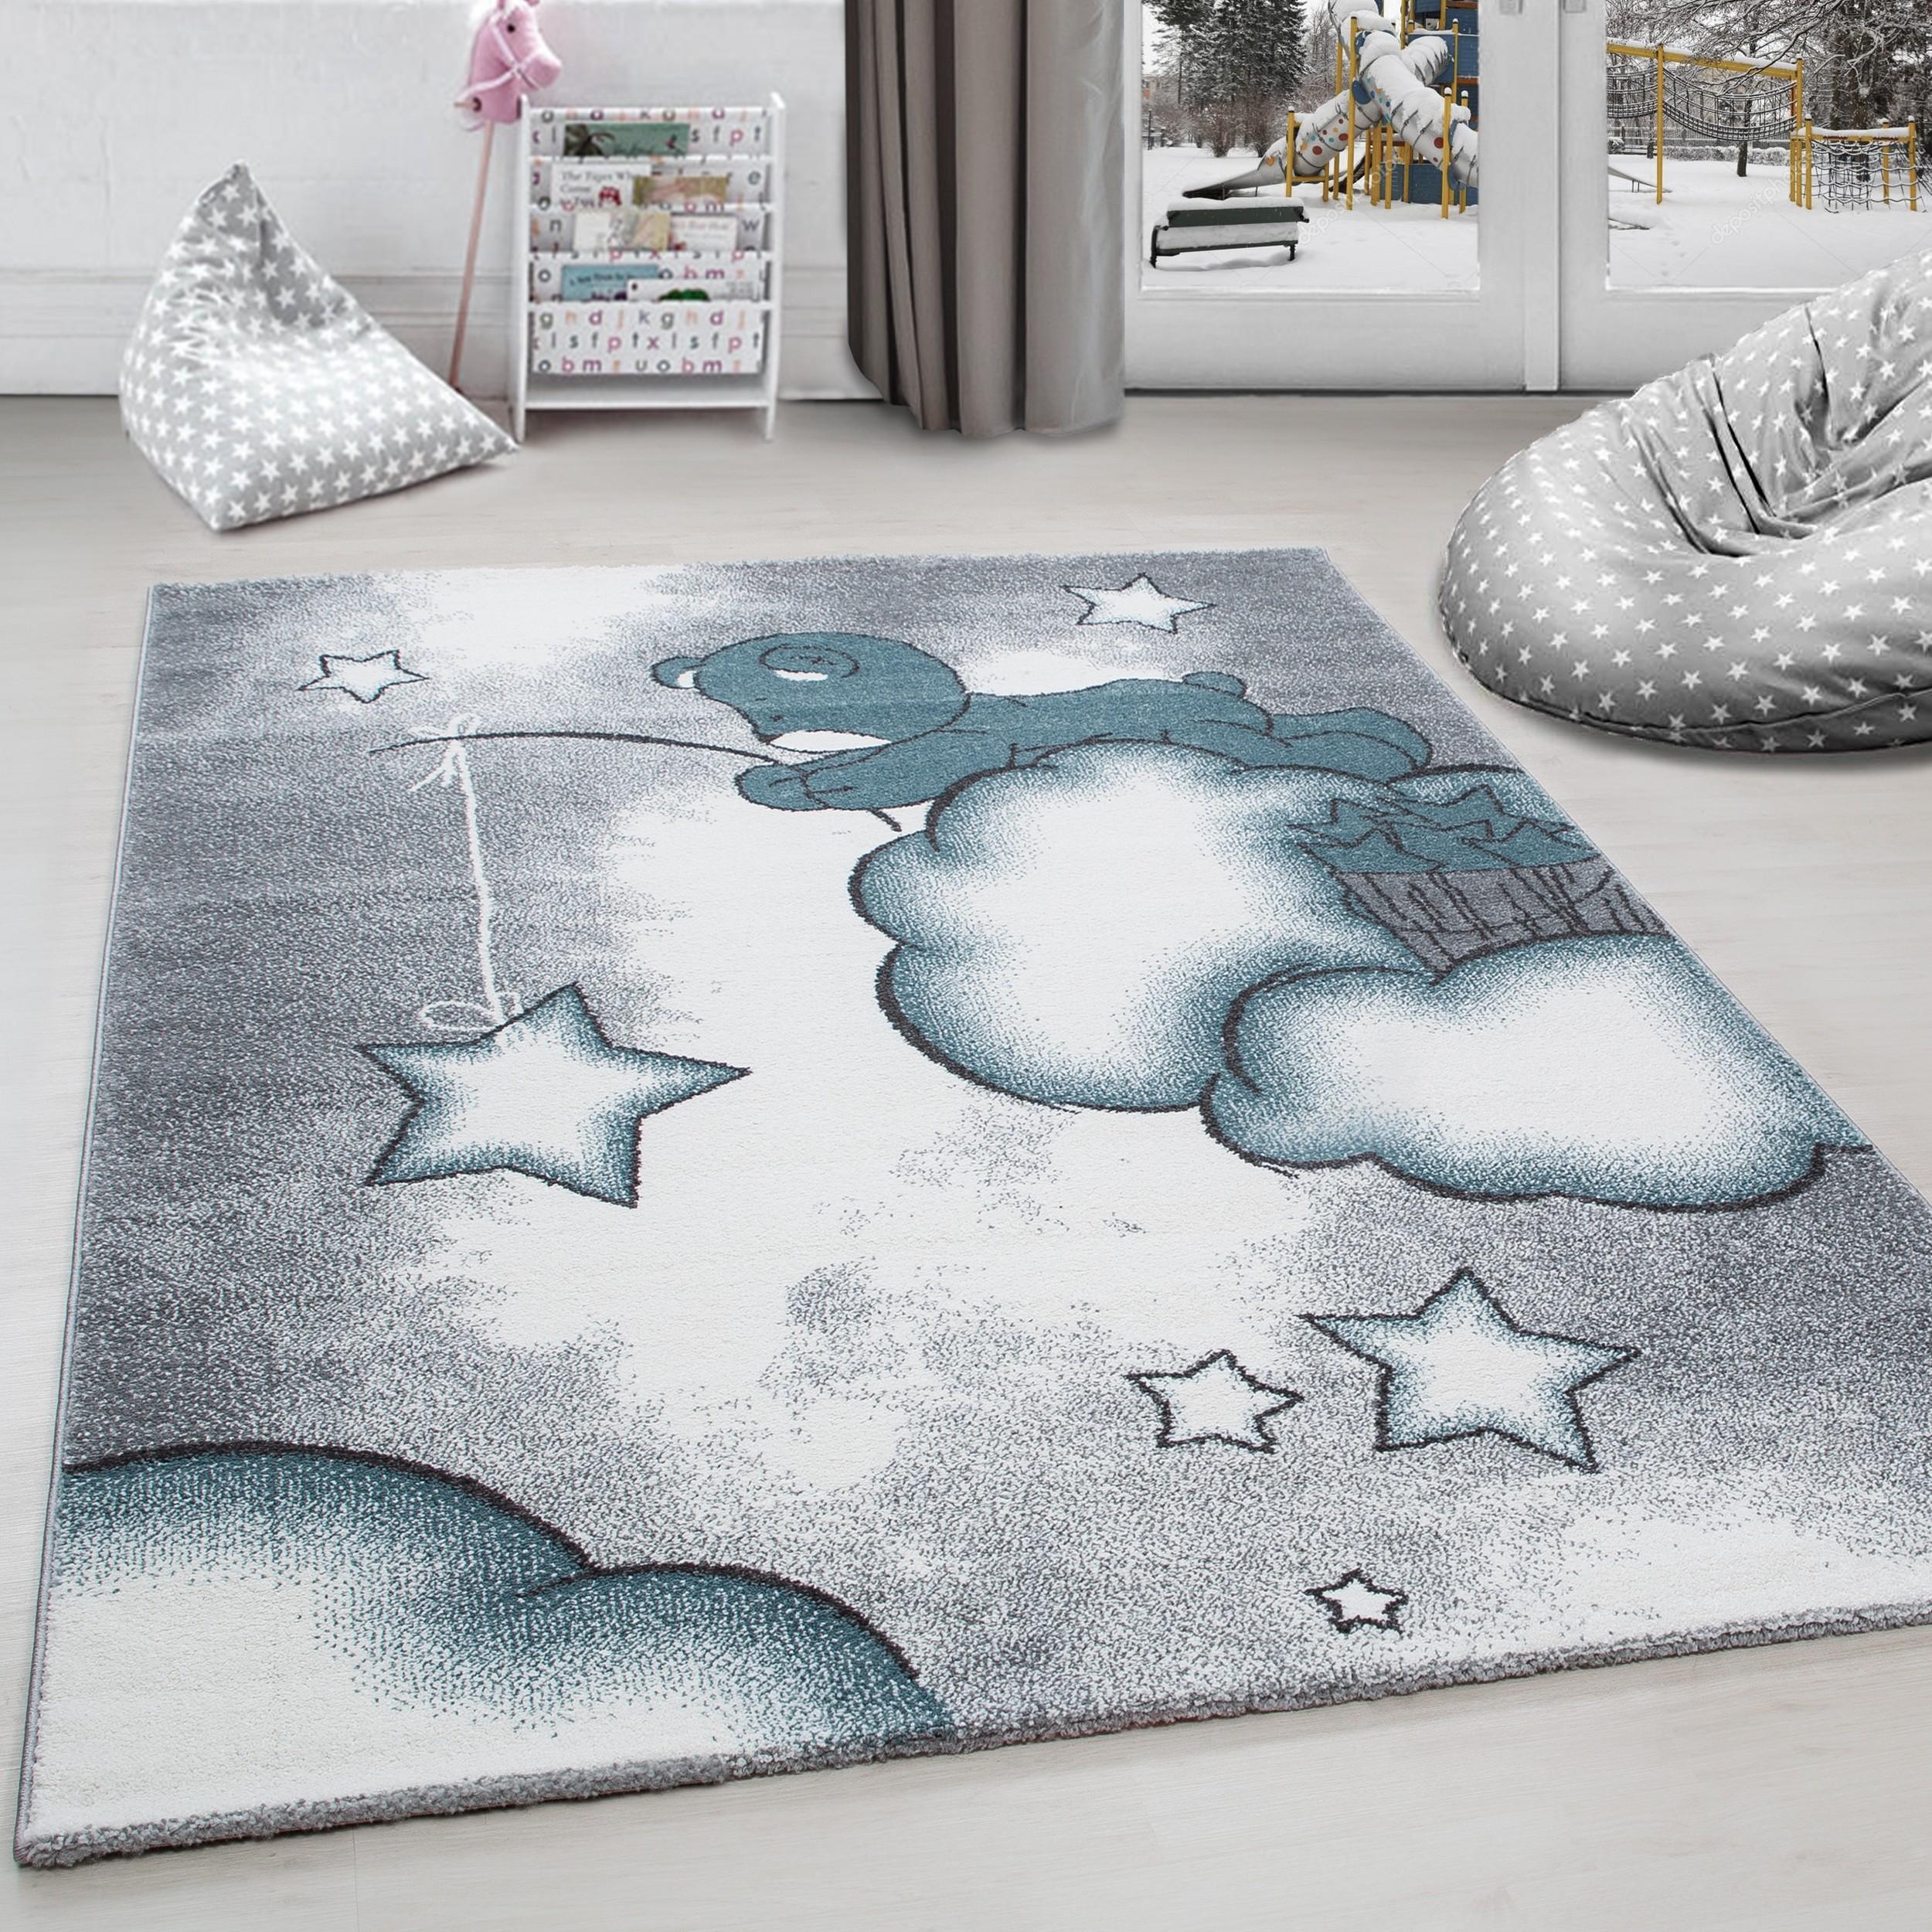 Full Size of Regale Kinderzimmer Regal Weiß Wohnzimmer Teppiche Sofa Kinderzimmer Kinderzimmer Teppiche